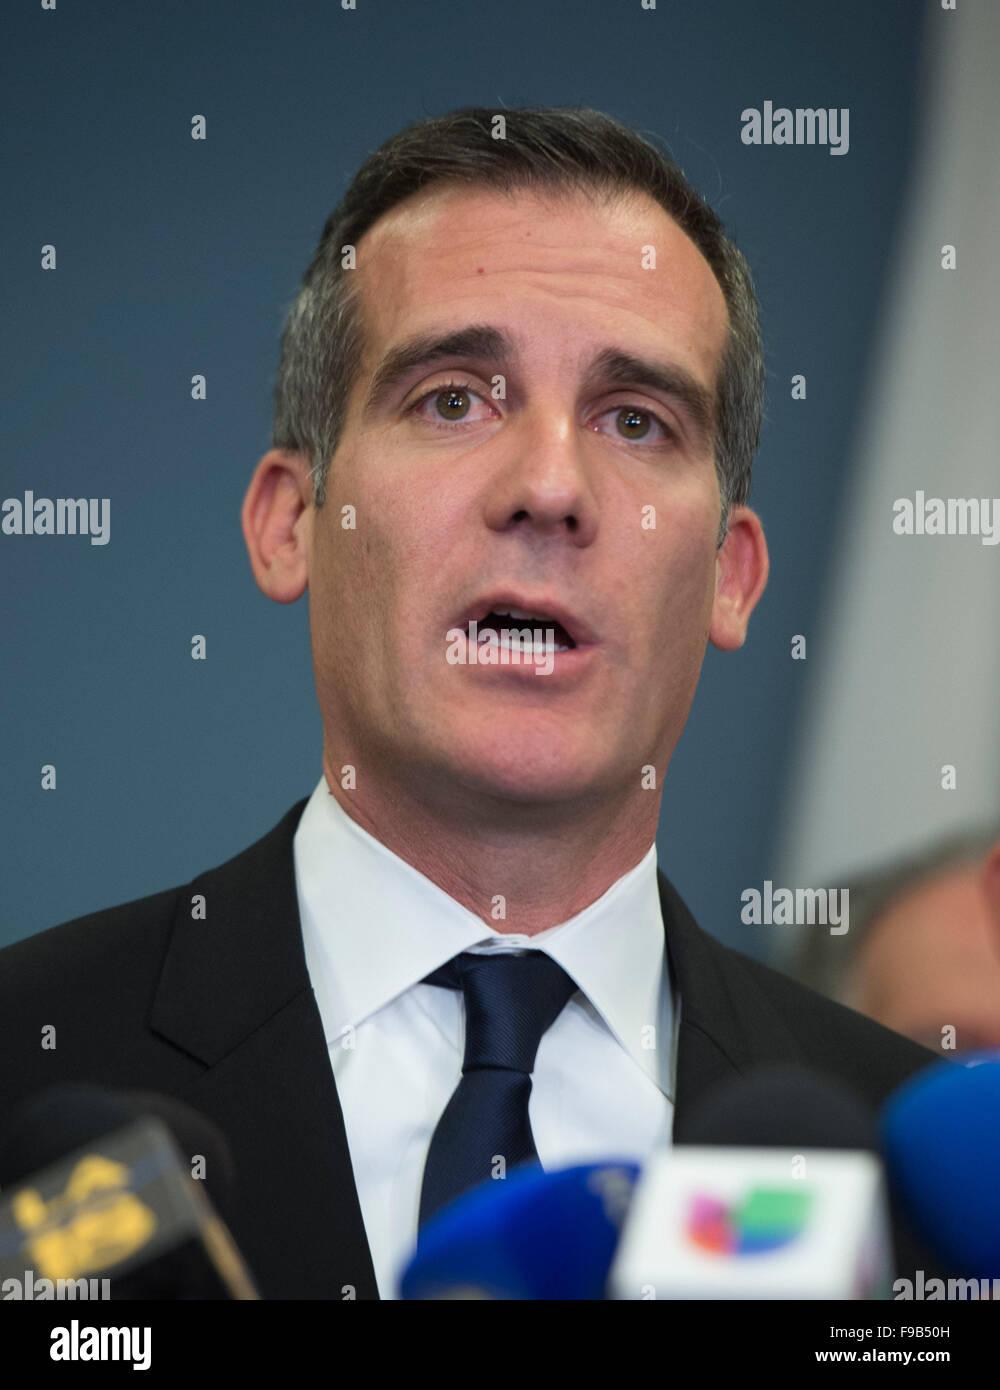 (151215) -- LOS ANGELES, Dec. 15, 2015 (Xinhua) -- Los Angeles Mayor Eric Garcetti speaks to the media, in Los Angeles, - Stock Image